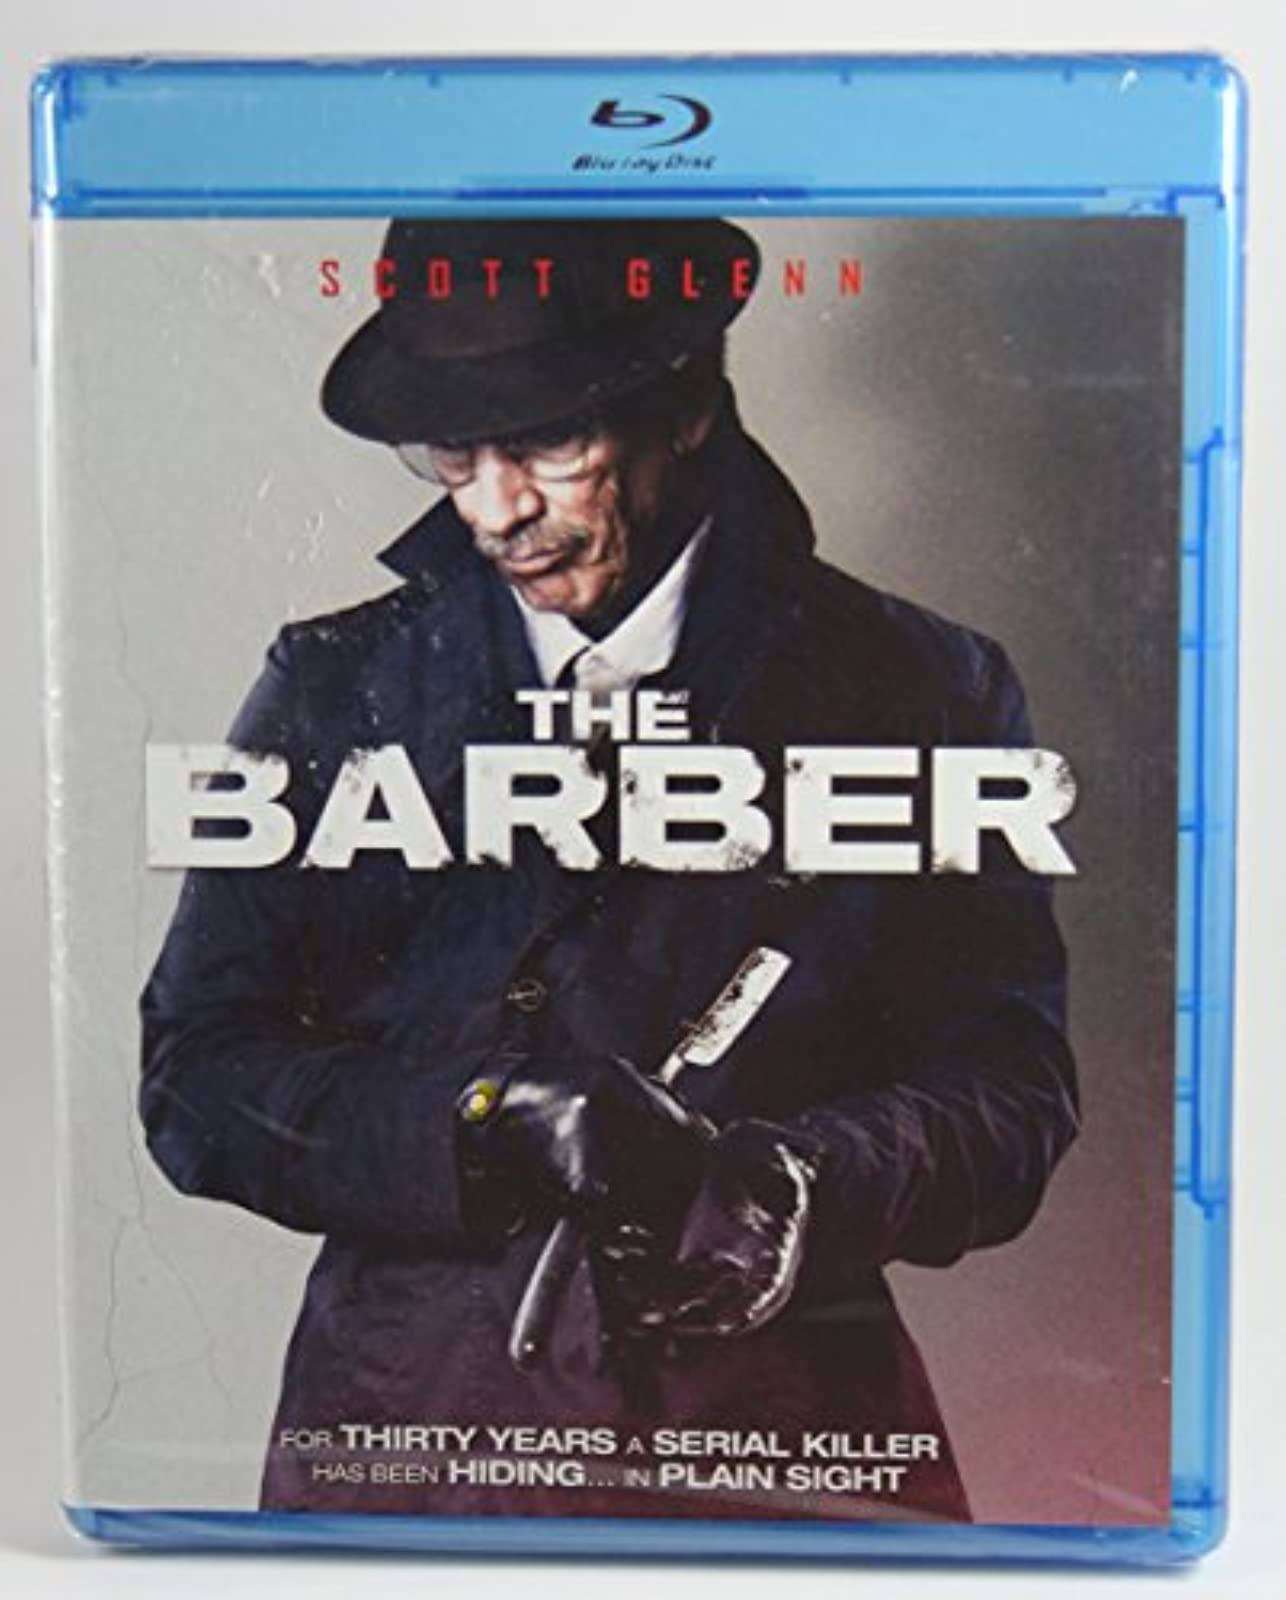 Barber Movie On Blu-Ray